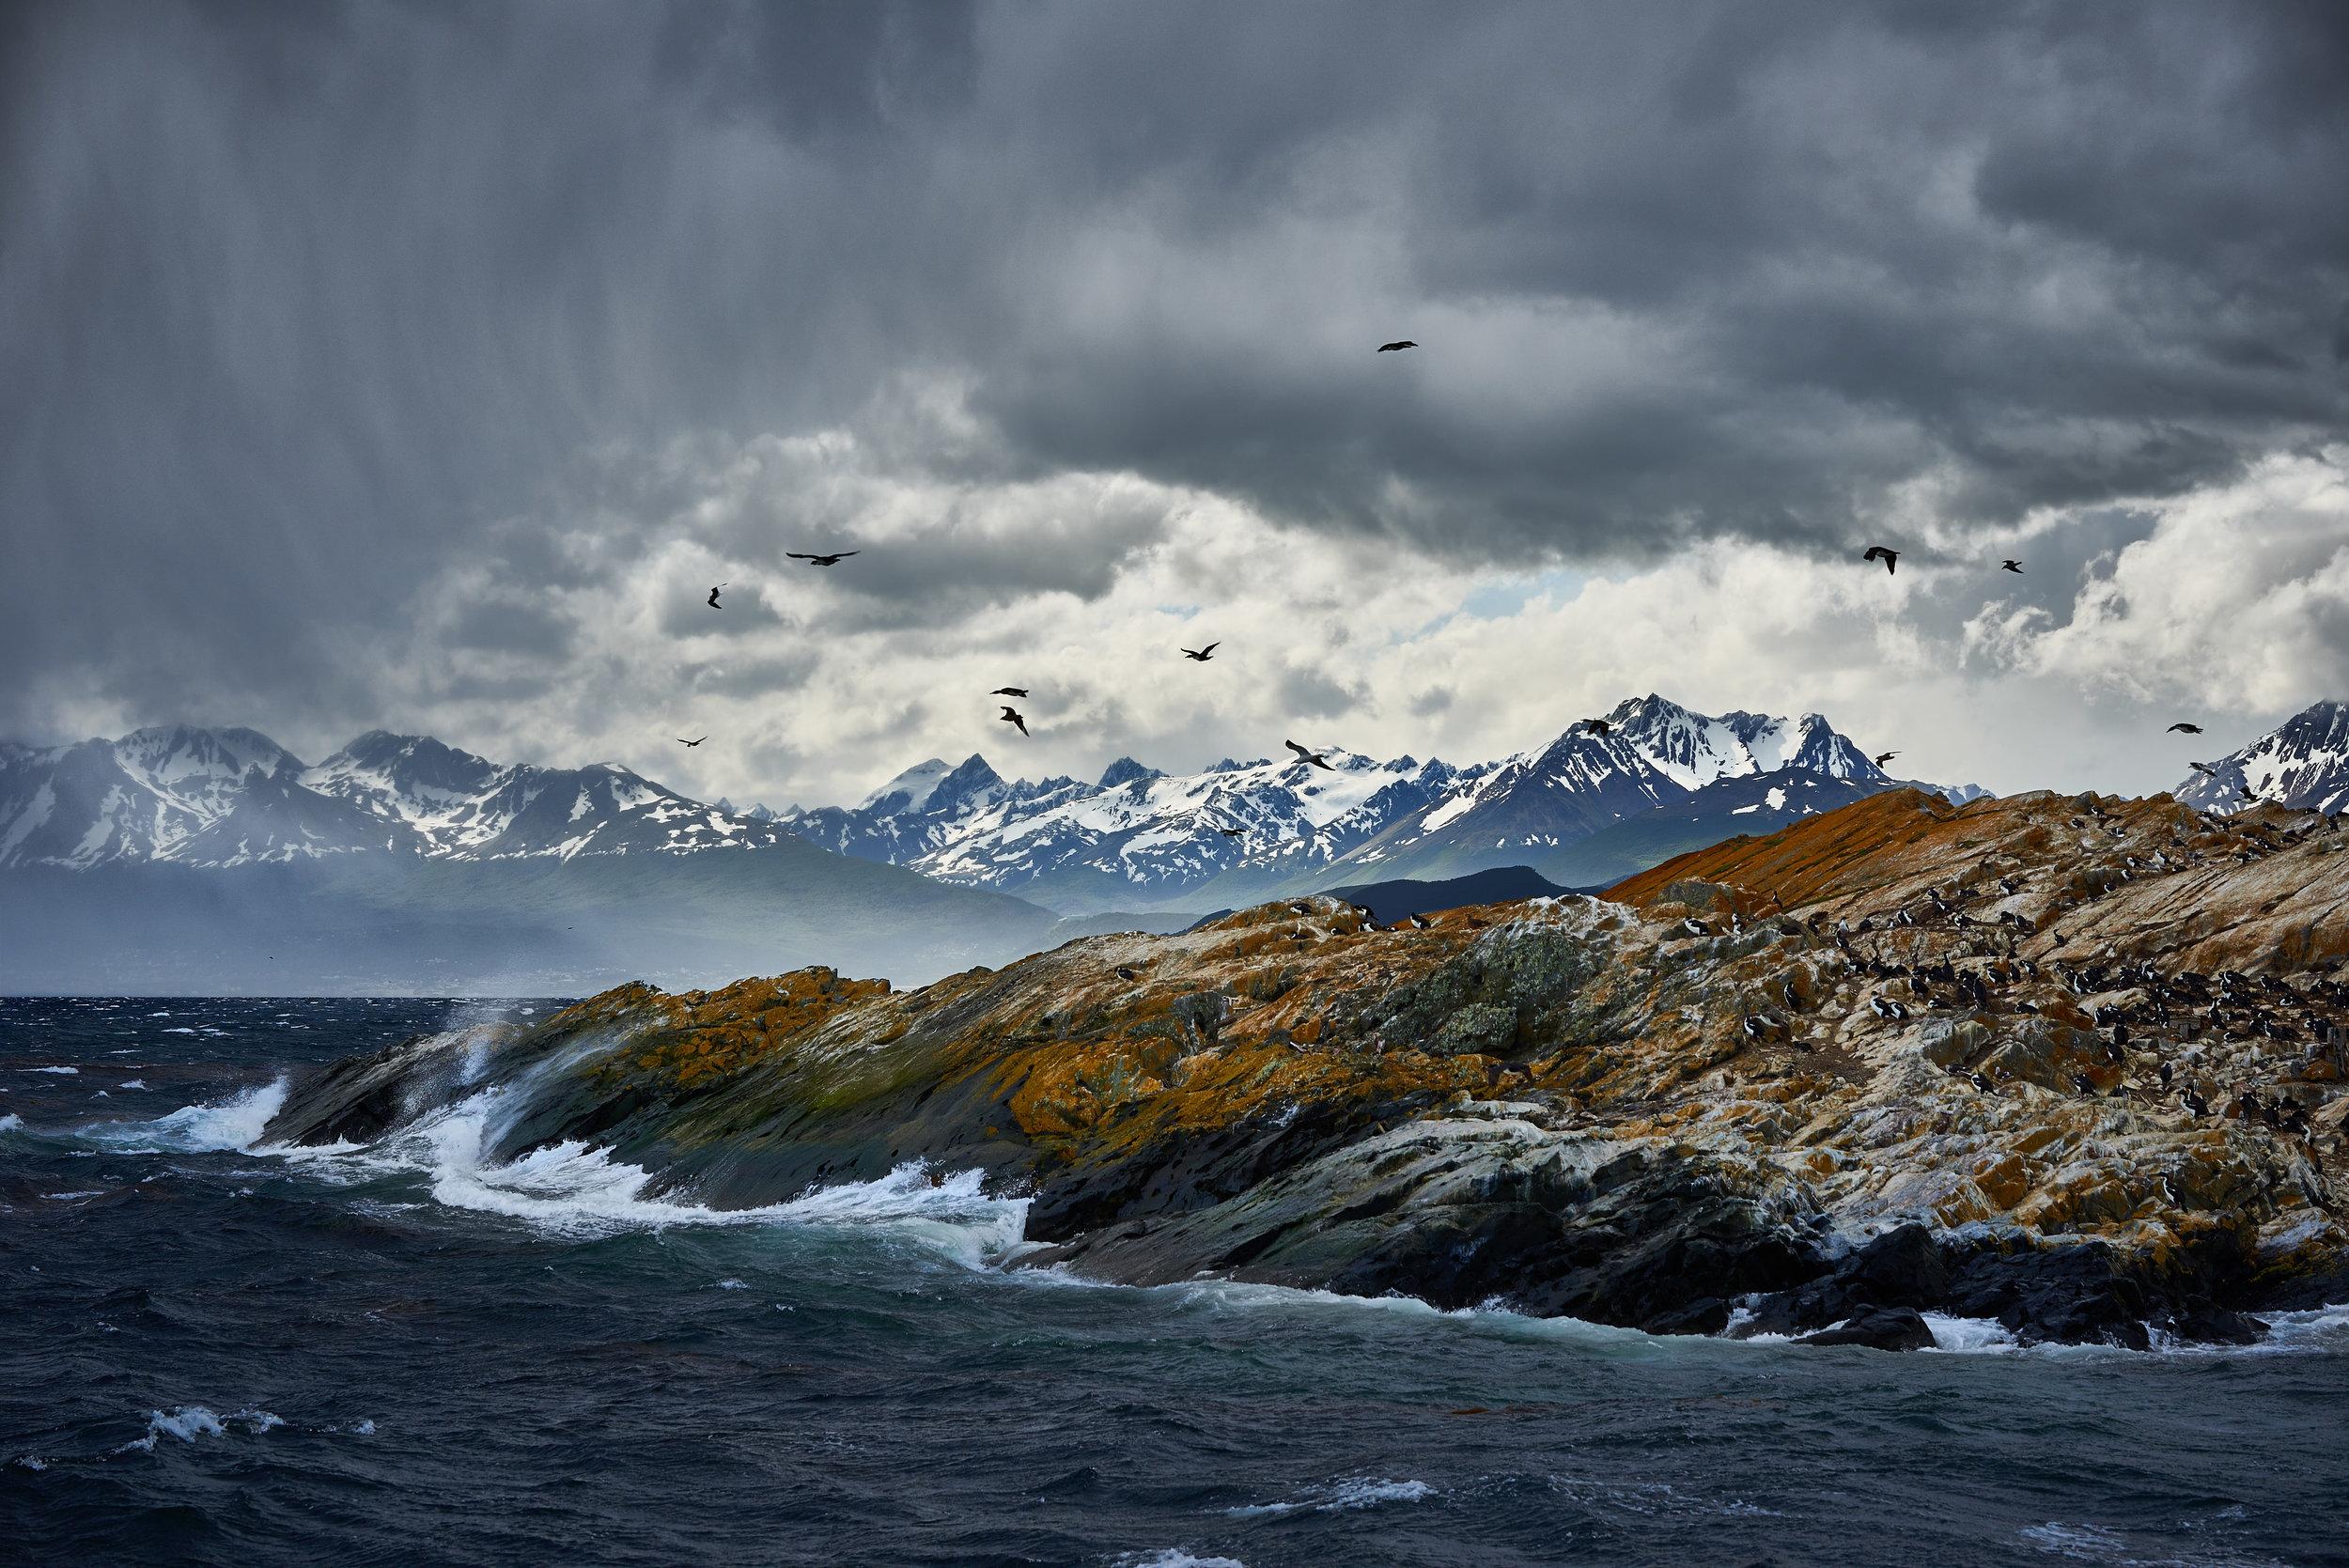 2015-12-17---Patagonia-1712-2.jpg